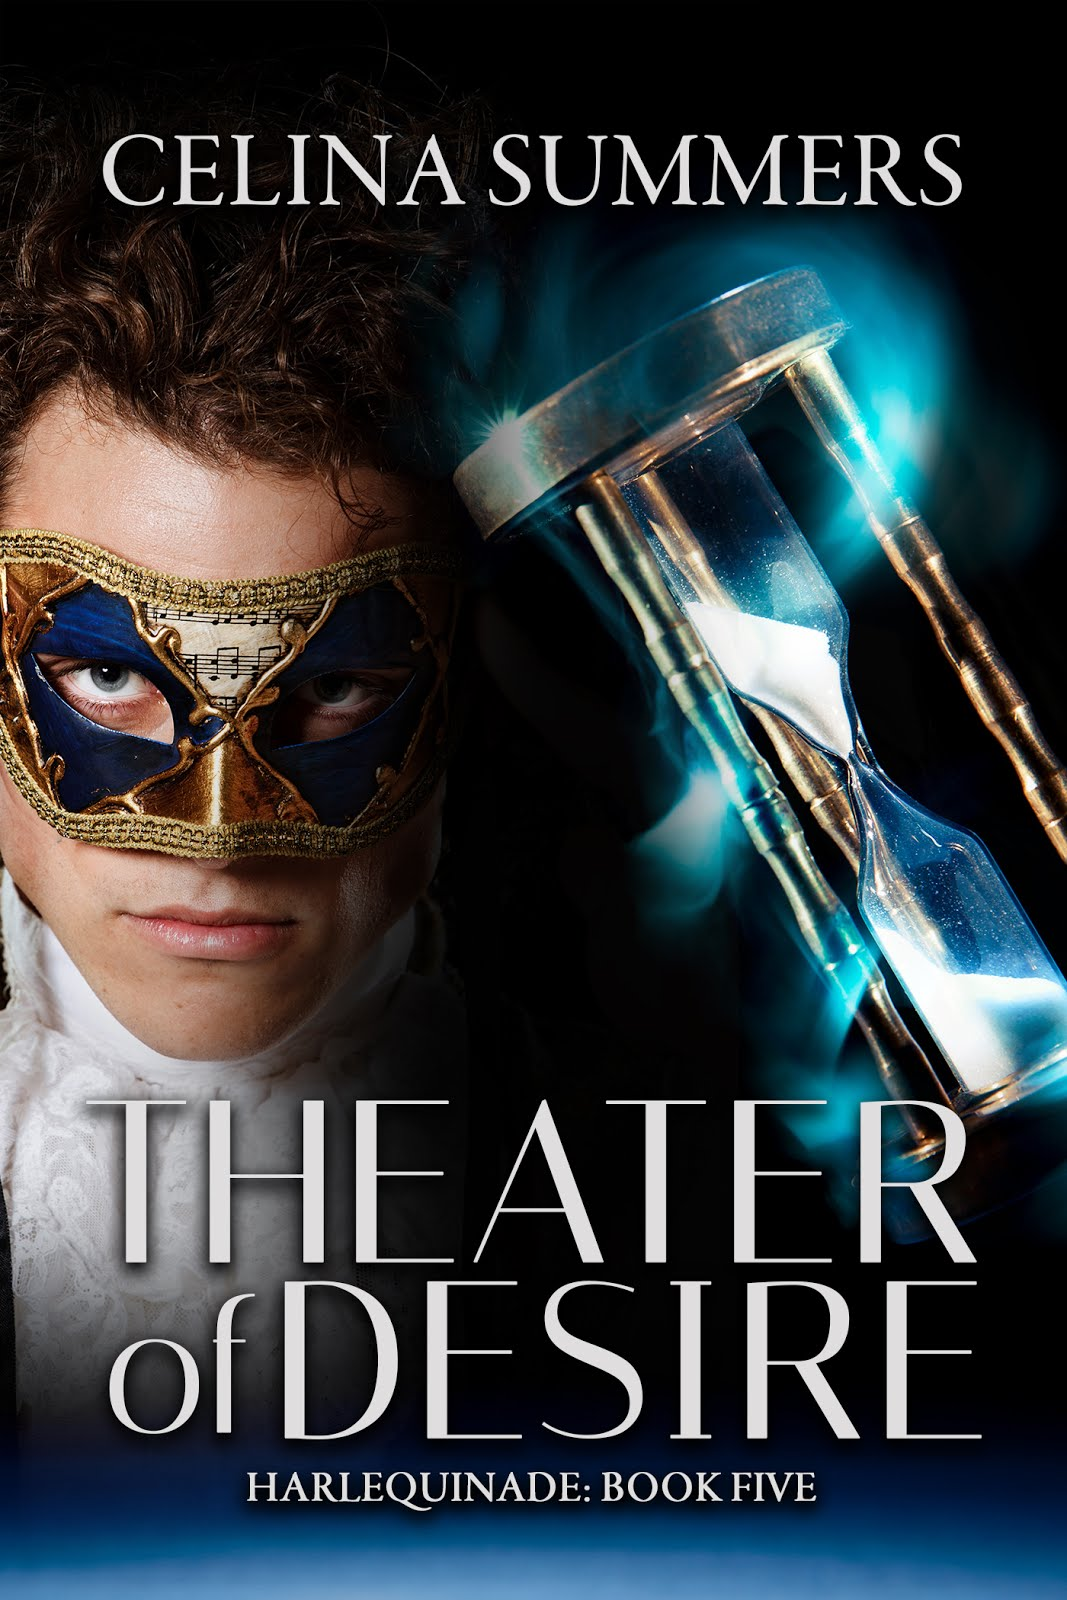 Theater of Desire